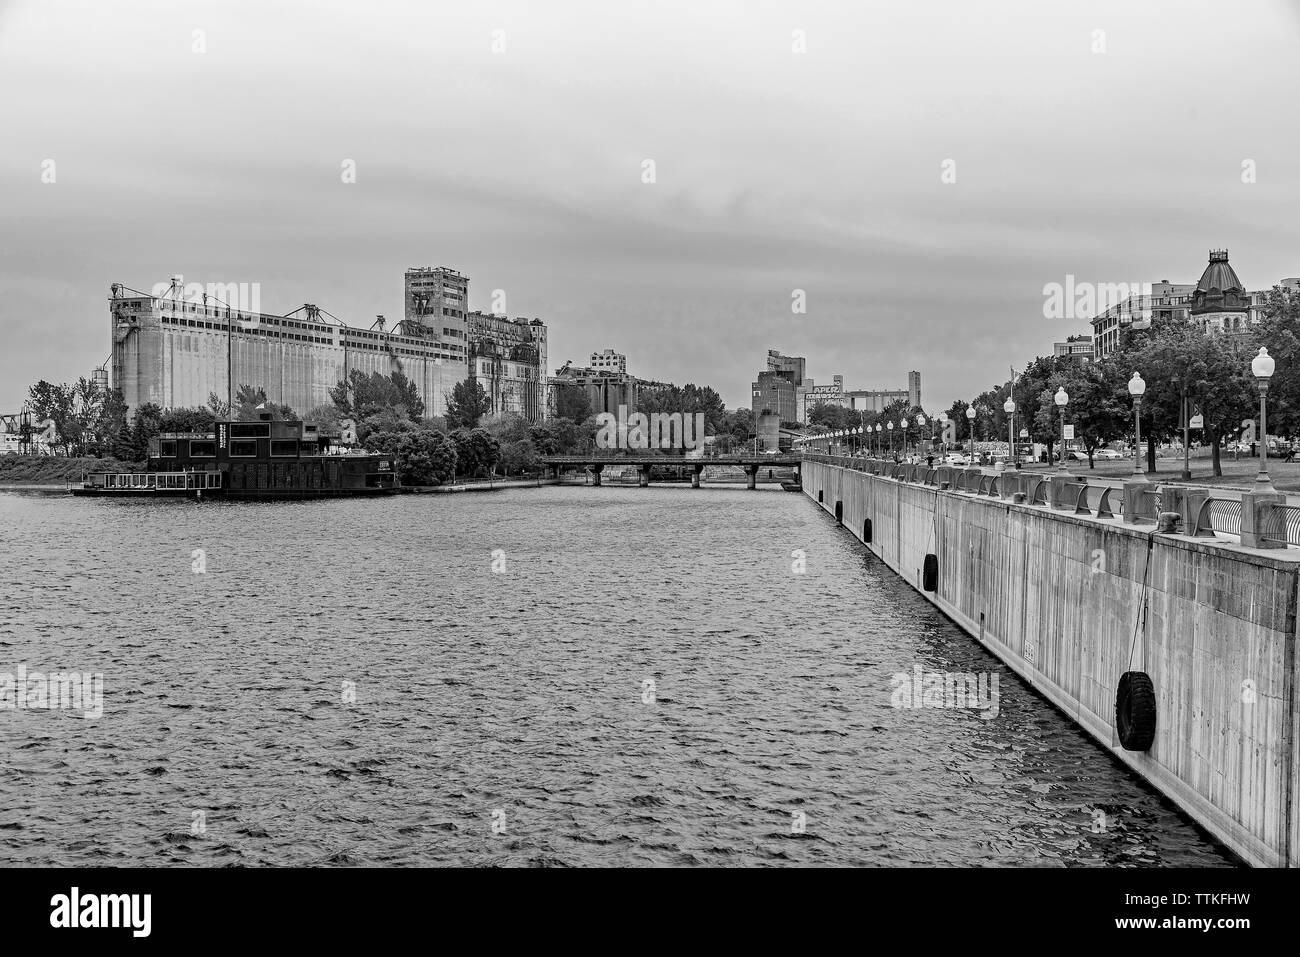 Views of Old Montreal Granaries. - Stock Image